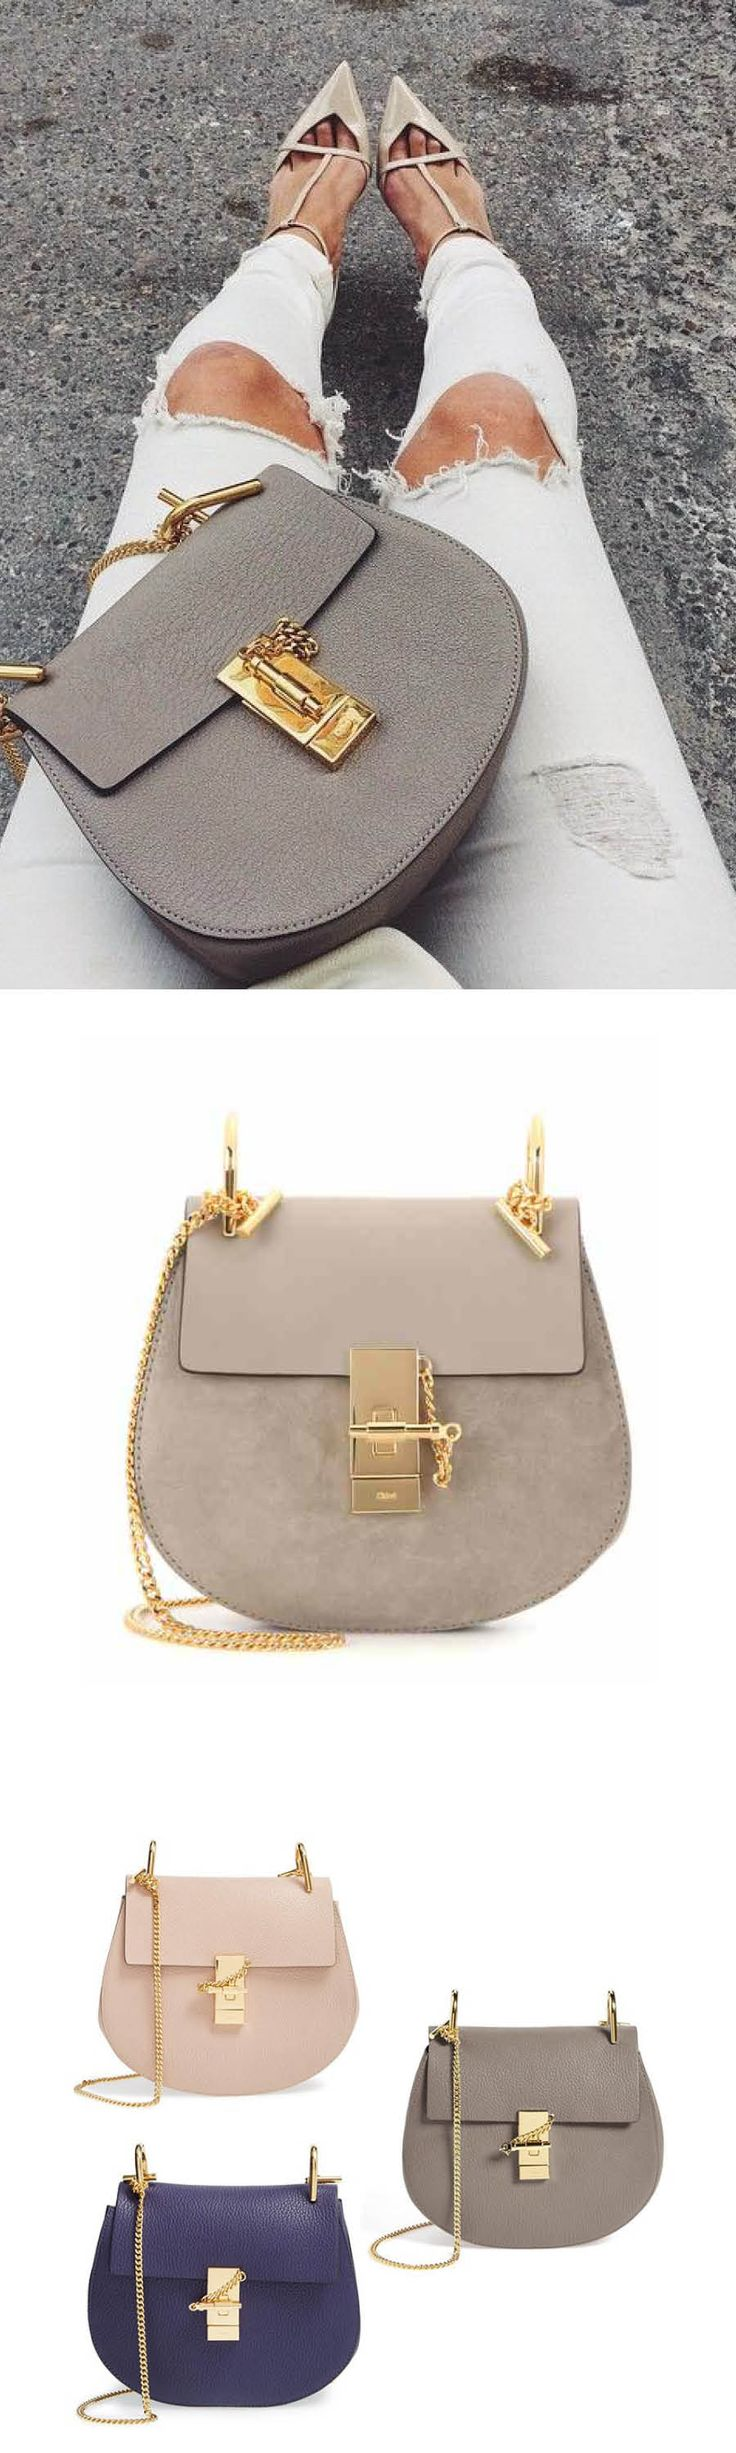 Outstanding handbag from Chloé  (Mini Drew Suede & Leather Saddle Bag)  #Chloe #handbag #accessoires #fashion #streetwear #modelstreetwear #trends2018